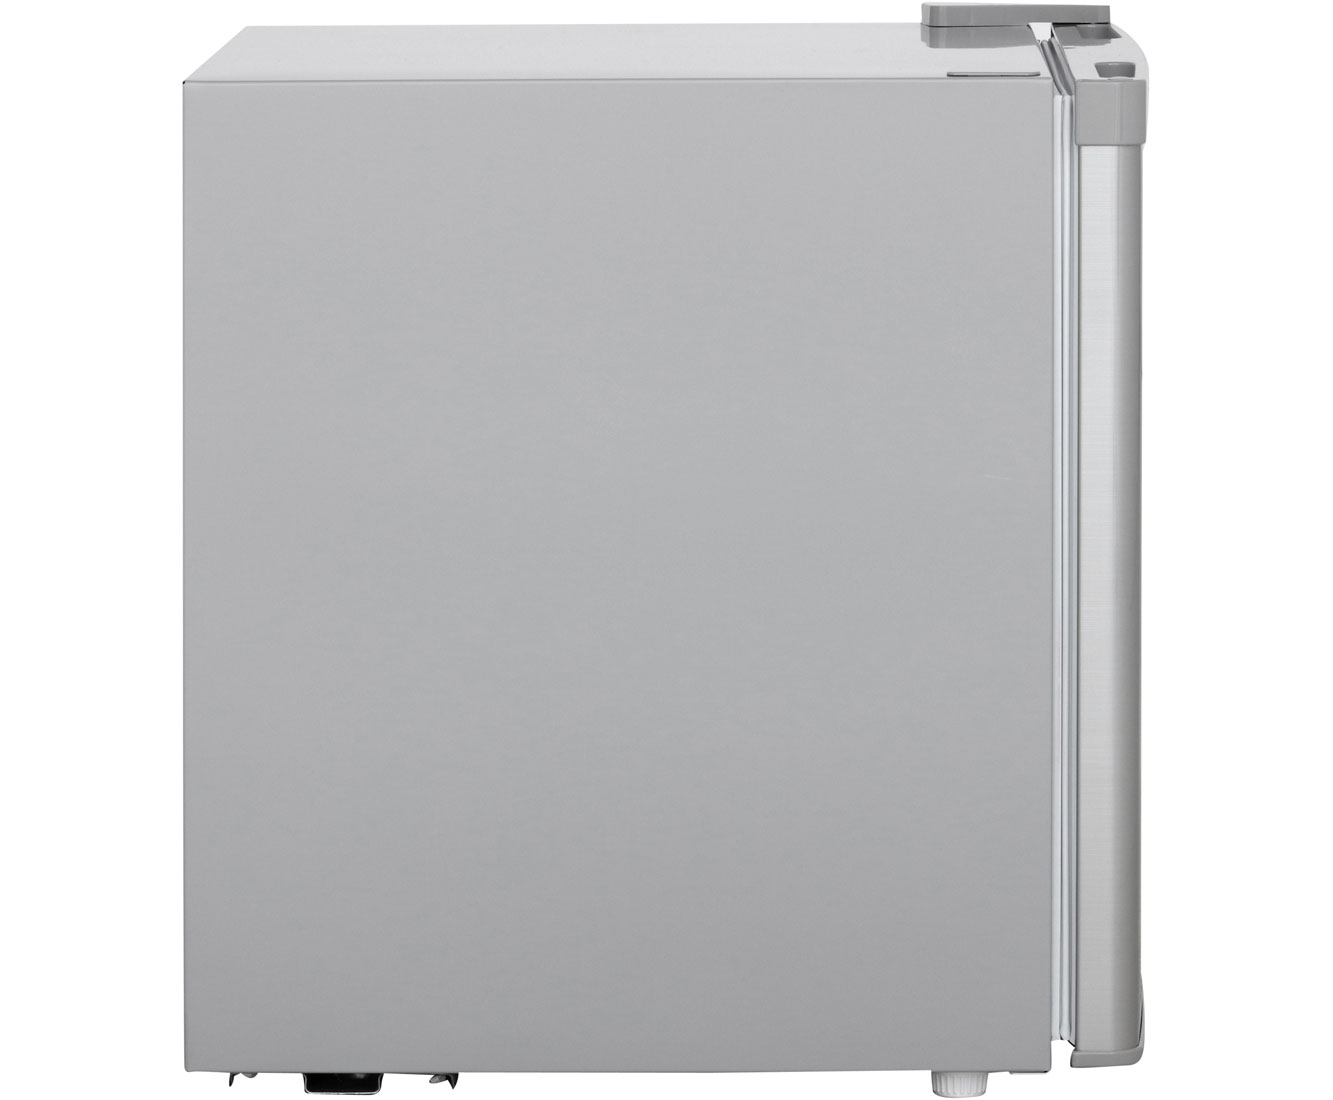 Bomann Kühlschrank Bewertung : Bomann kb kühlschrank weiß a